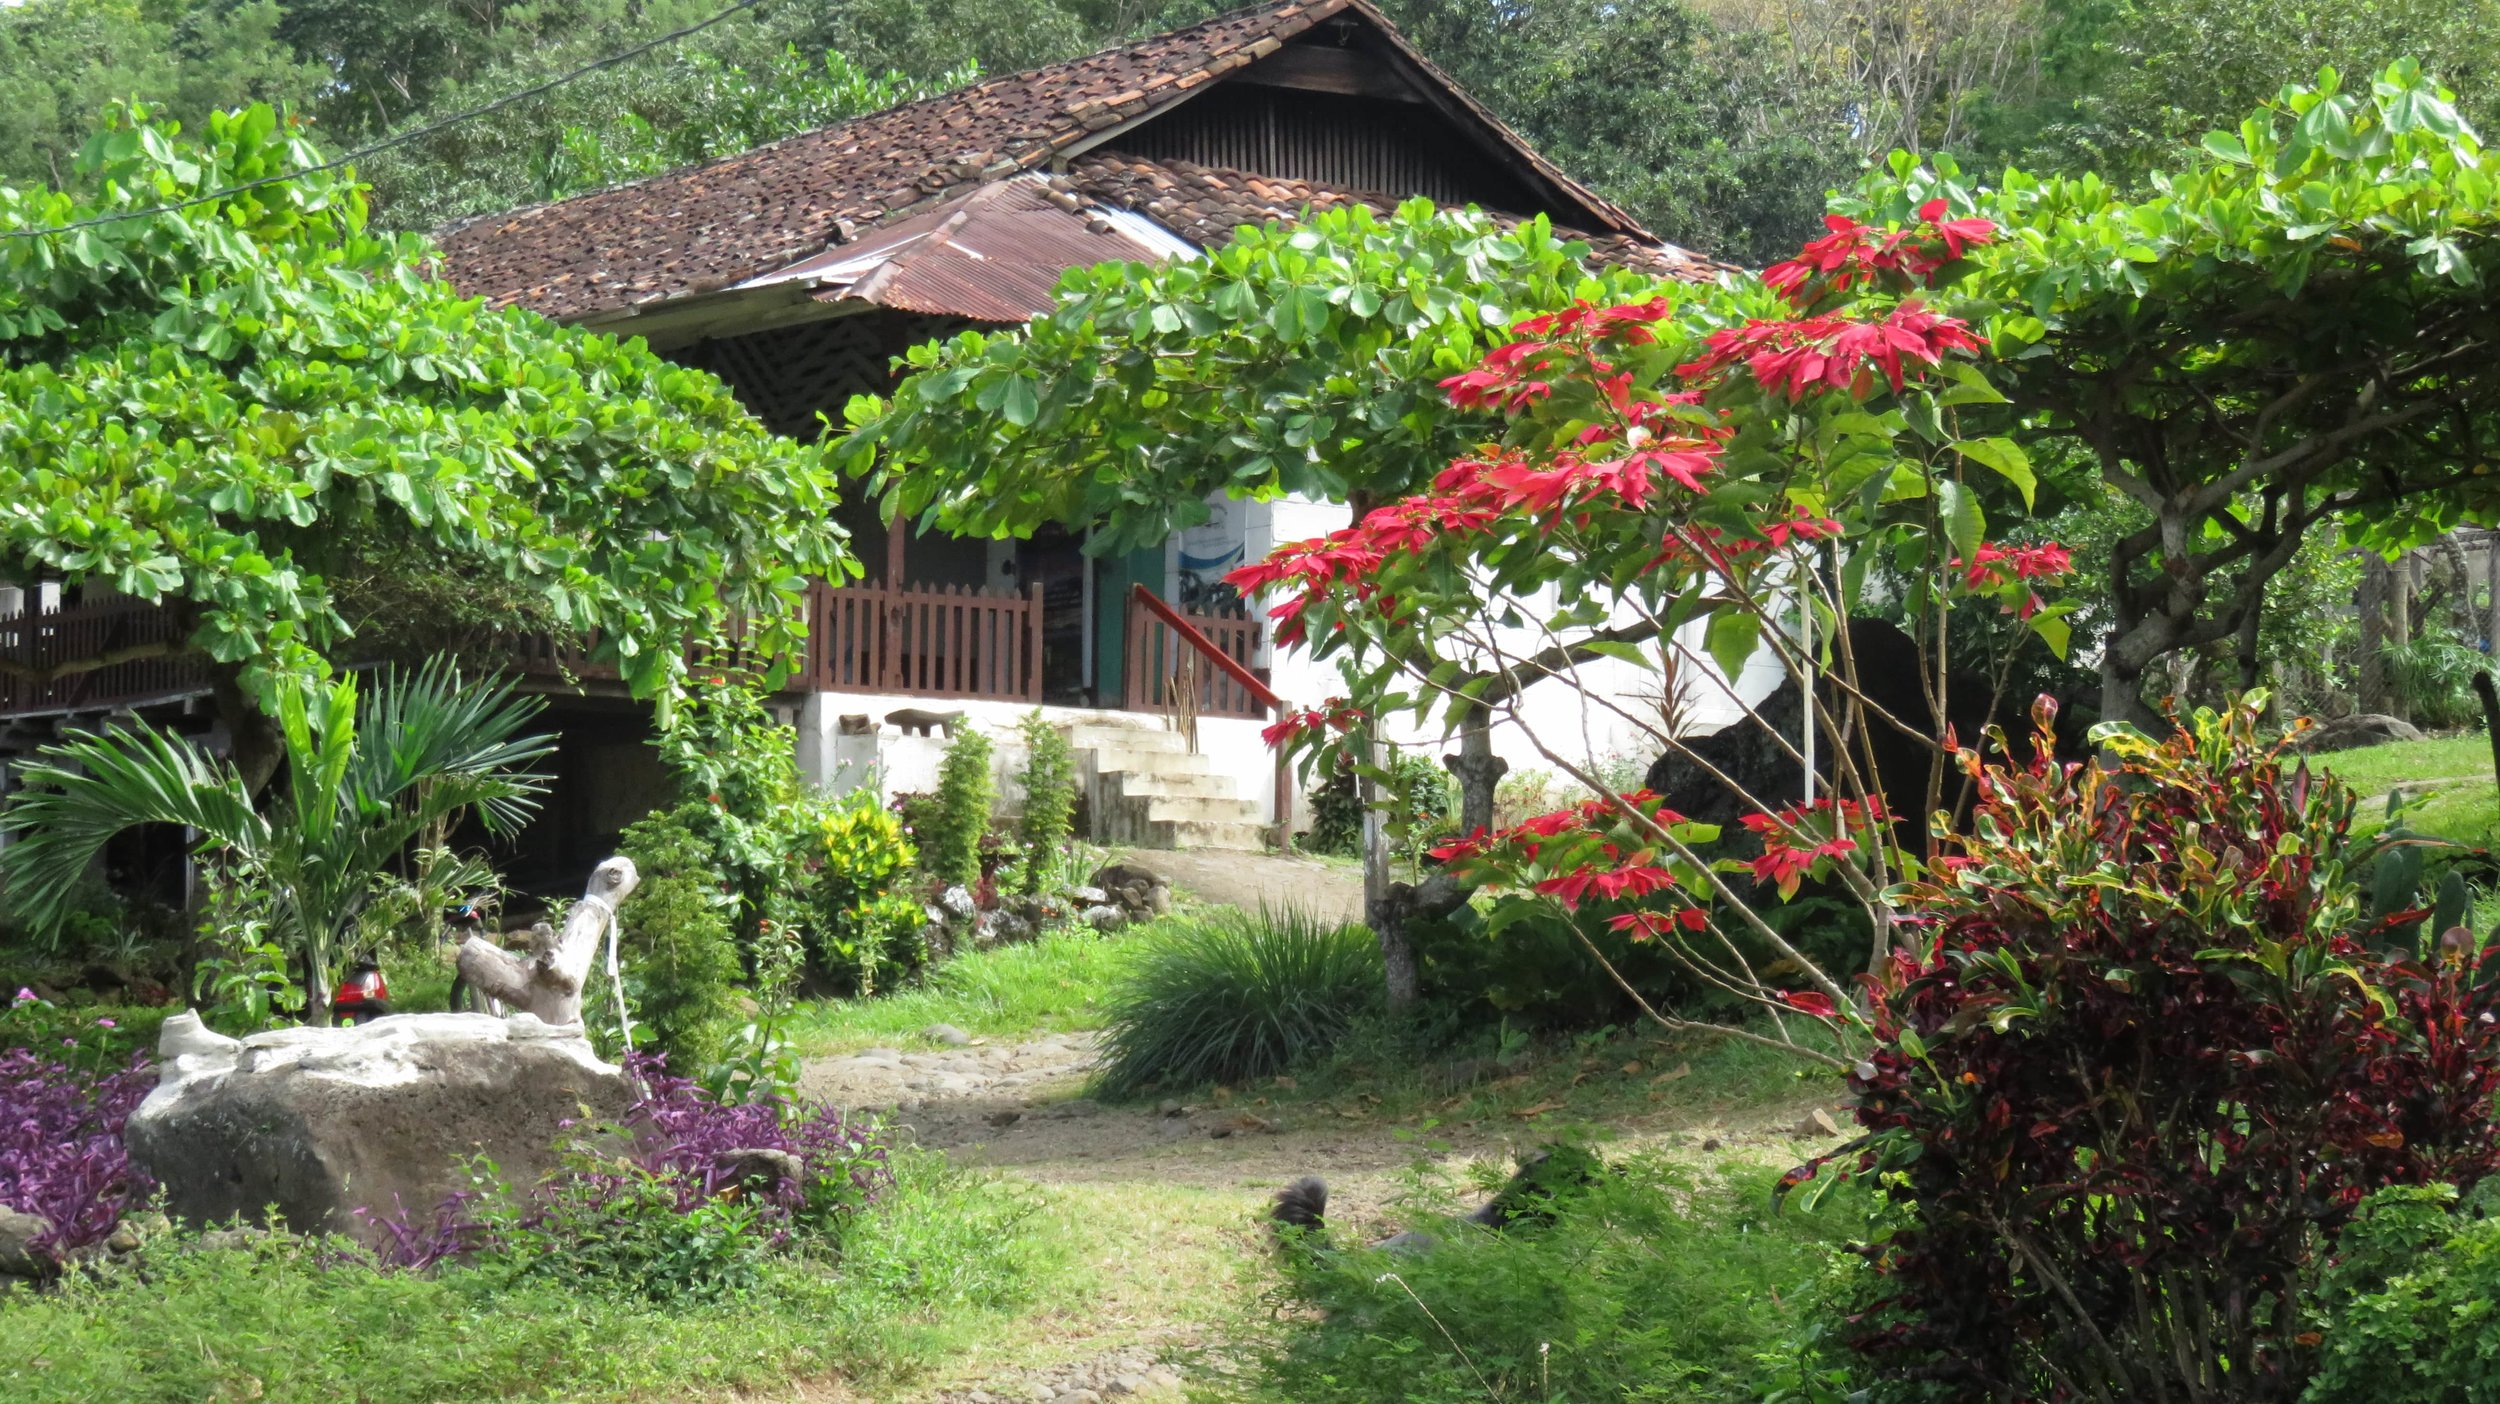 Finca Magdalena entrance, hiking trails, coffee plantations, petroglyphs Isla Ometepe